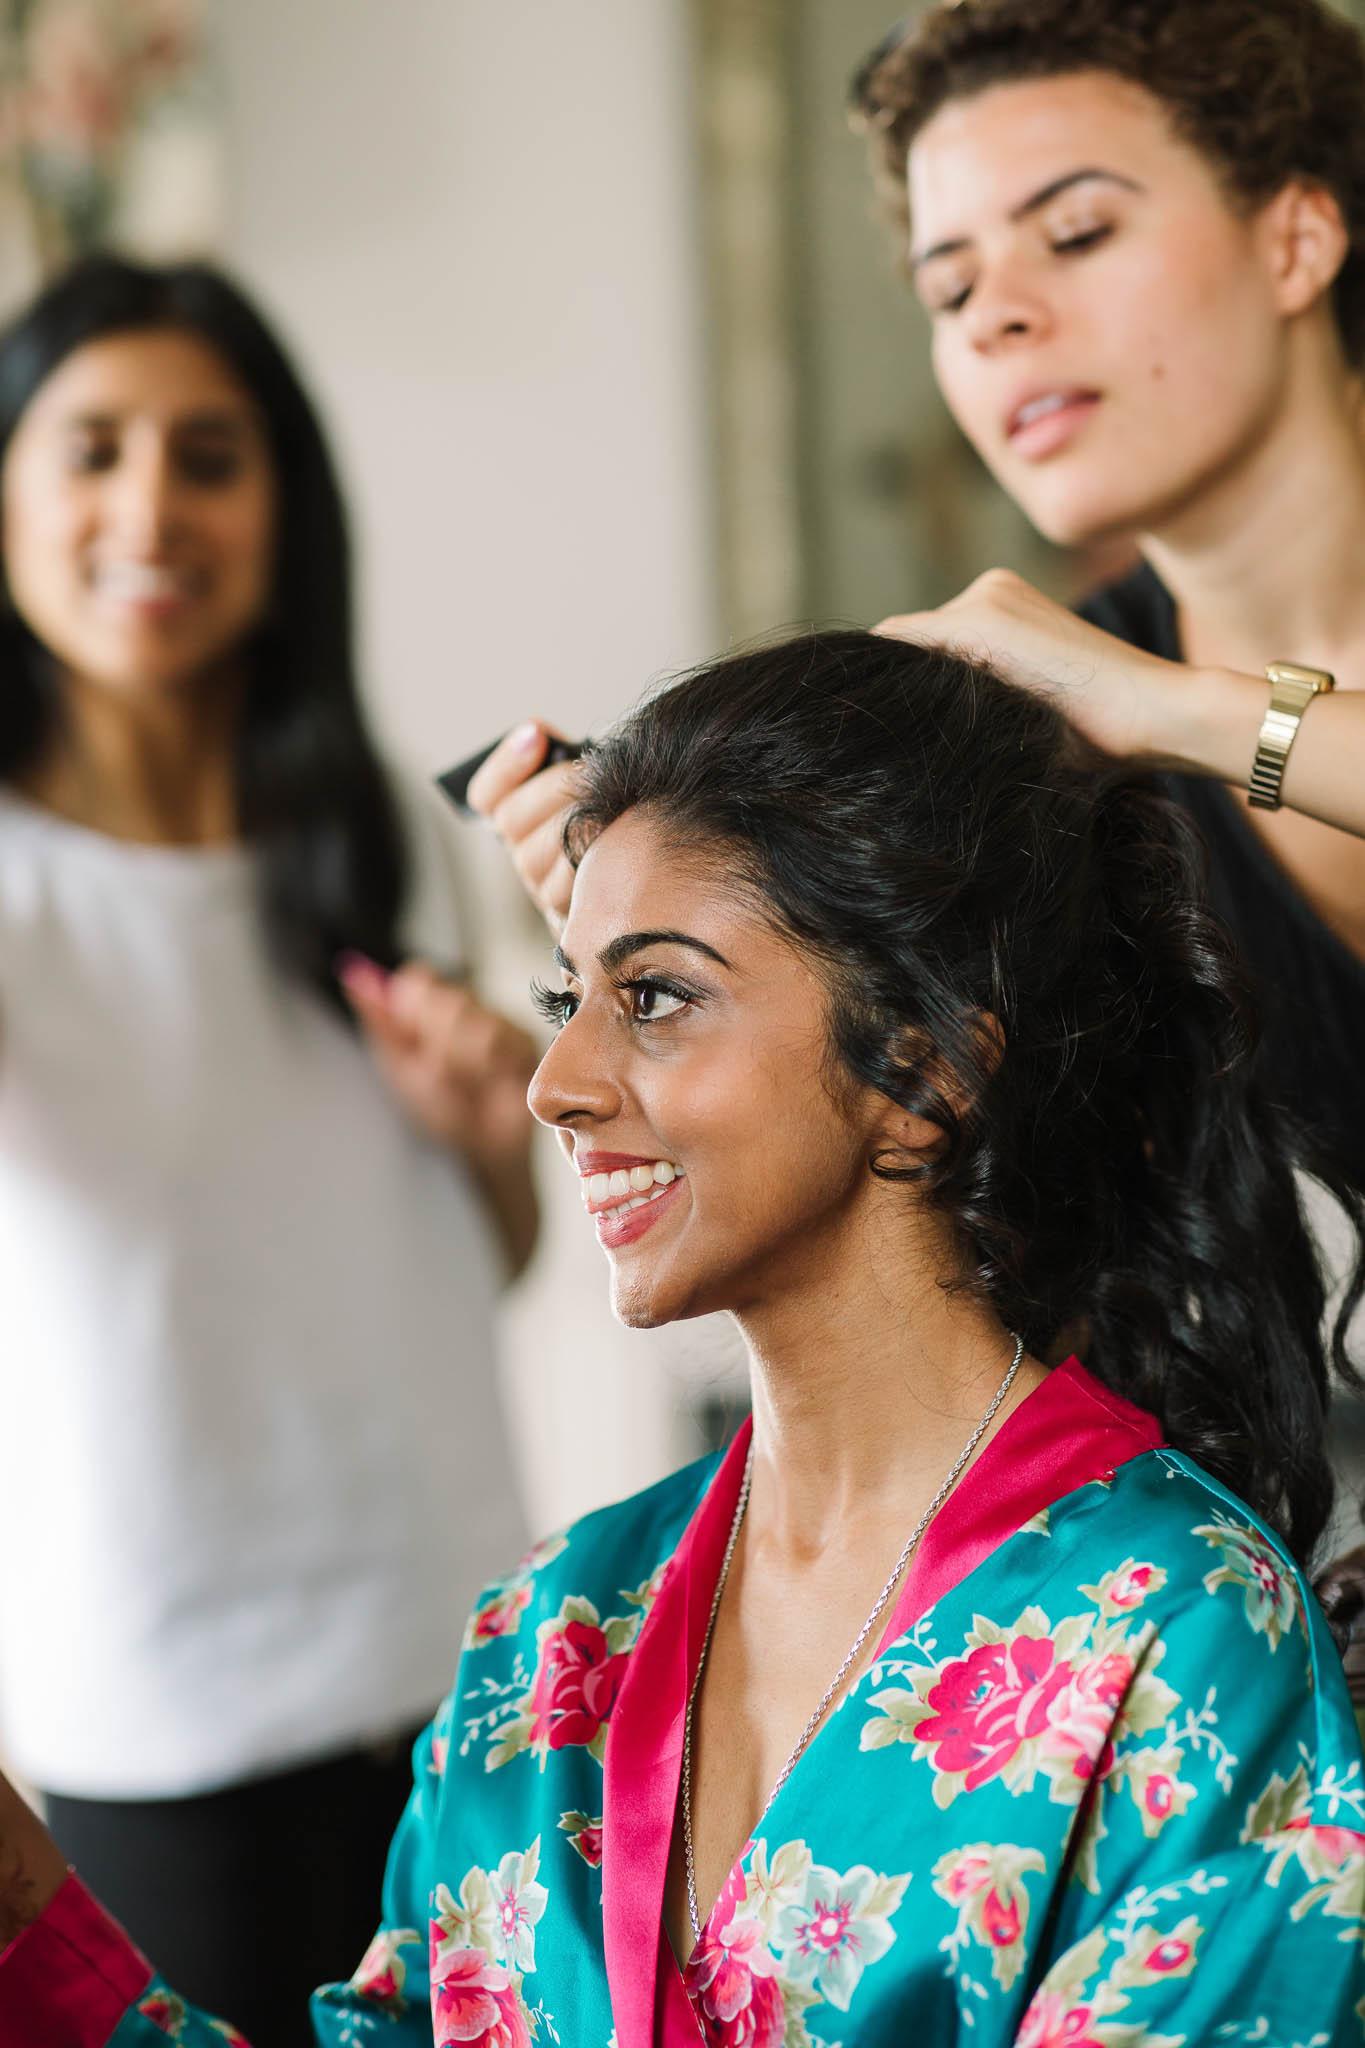 bride getting hair done at wedding